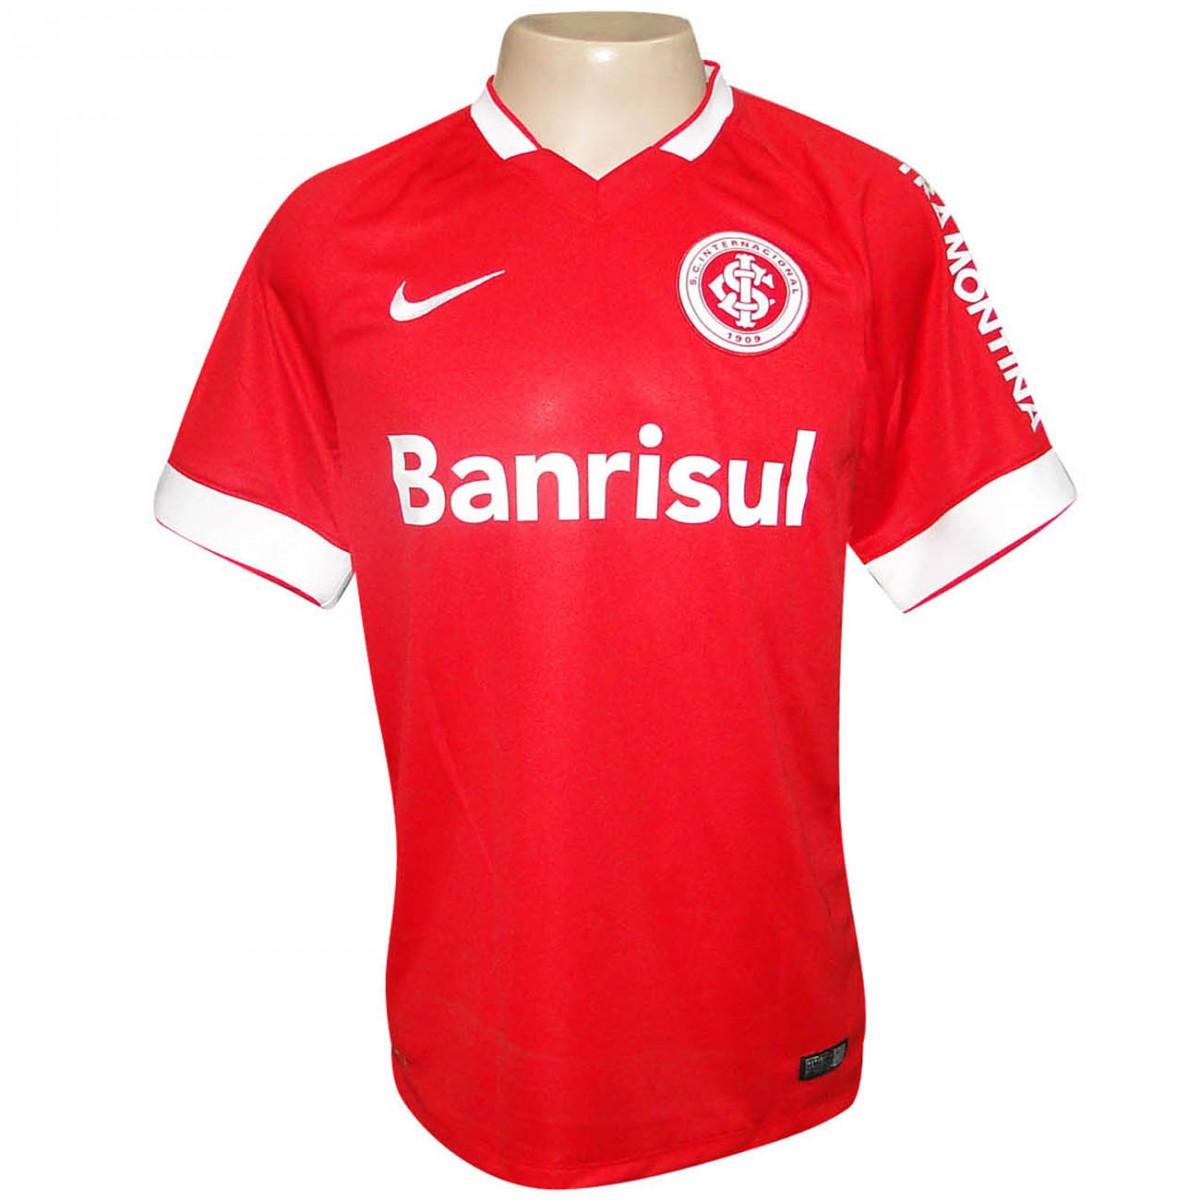 0530f1f4559 Camisa Inter Nike 2014 619204 612 - Vermelho Branco - Chuteira Nike ...